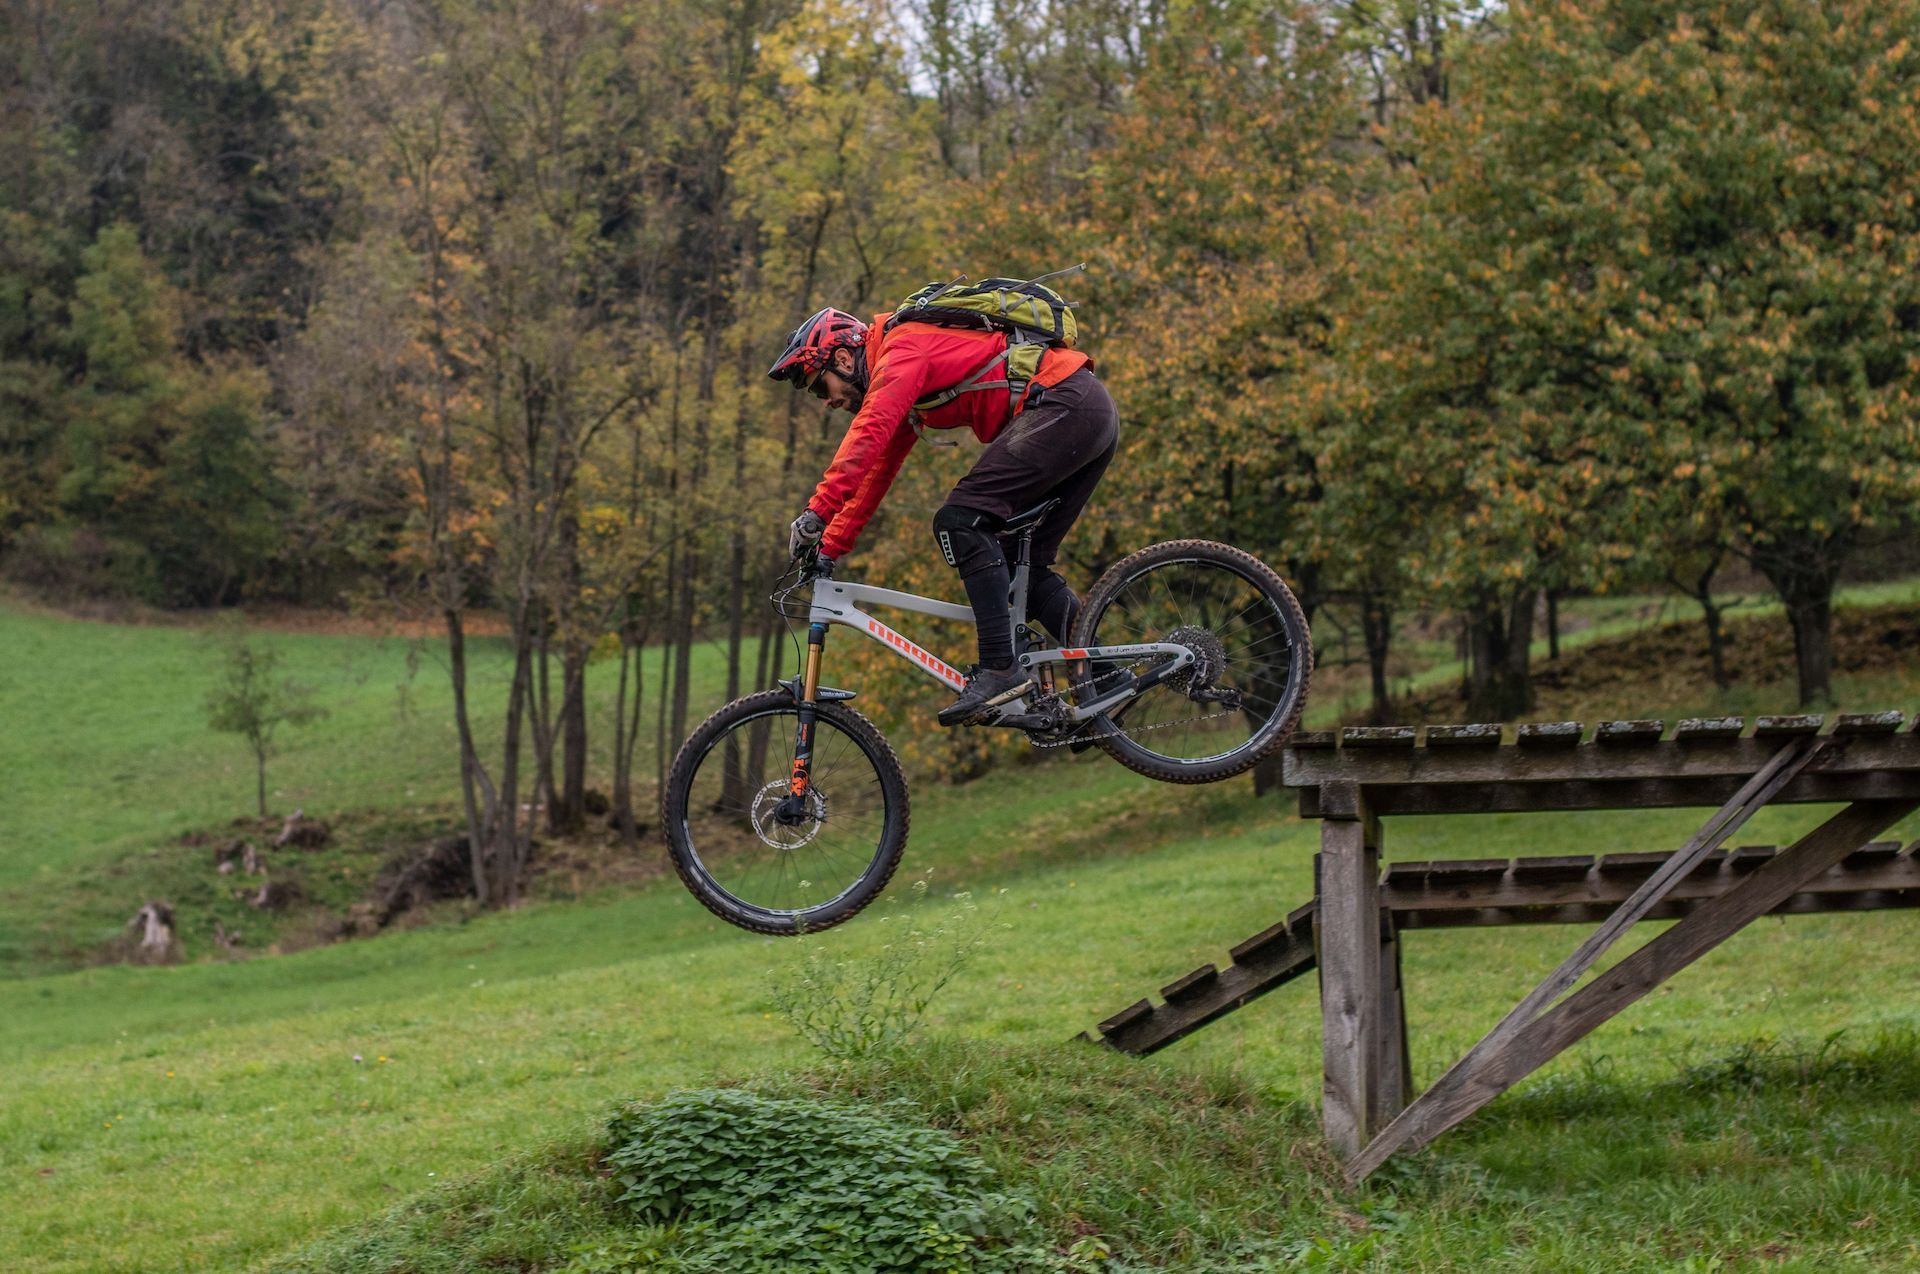 MTB Fahrtechnik Kurse im Bikepark Osternohe - Bike Training mit Rock my Trail Bikeschule - Geisskopf